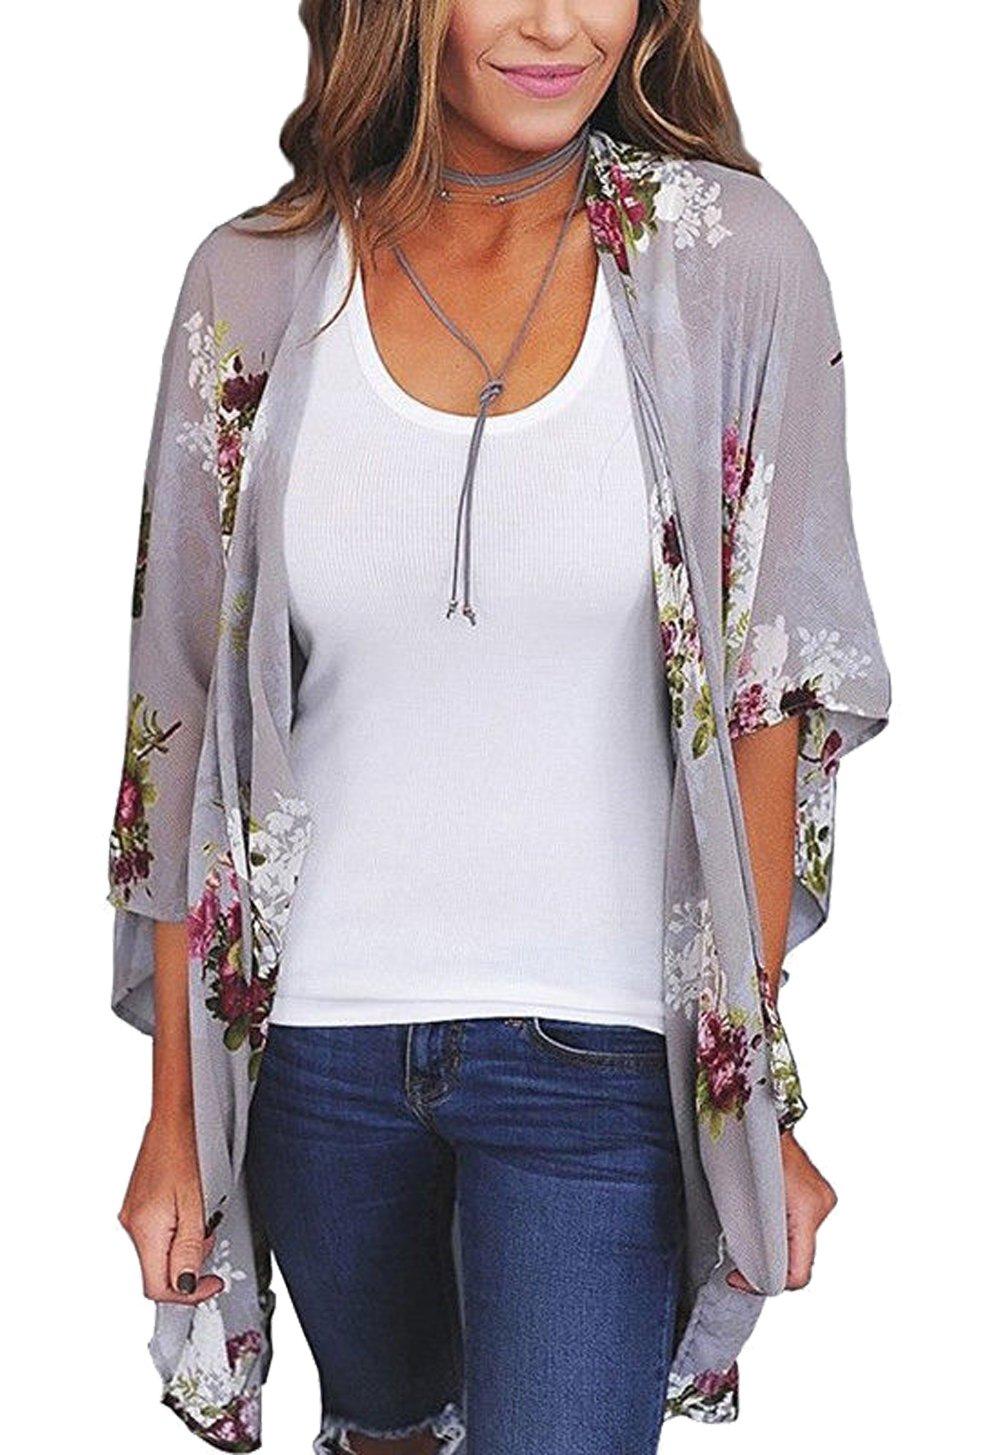 Relipop Women's Sheer Chiffon Blouse Loose Tops Kimono Floral Print Cardigan (Large, Style 34) by Relipop (Image #1)